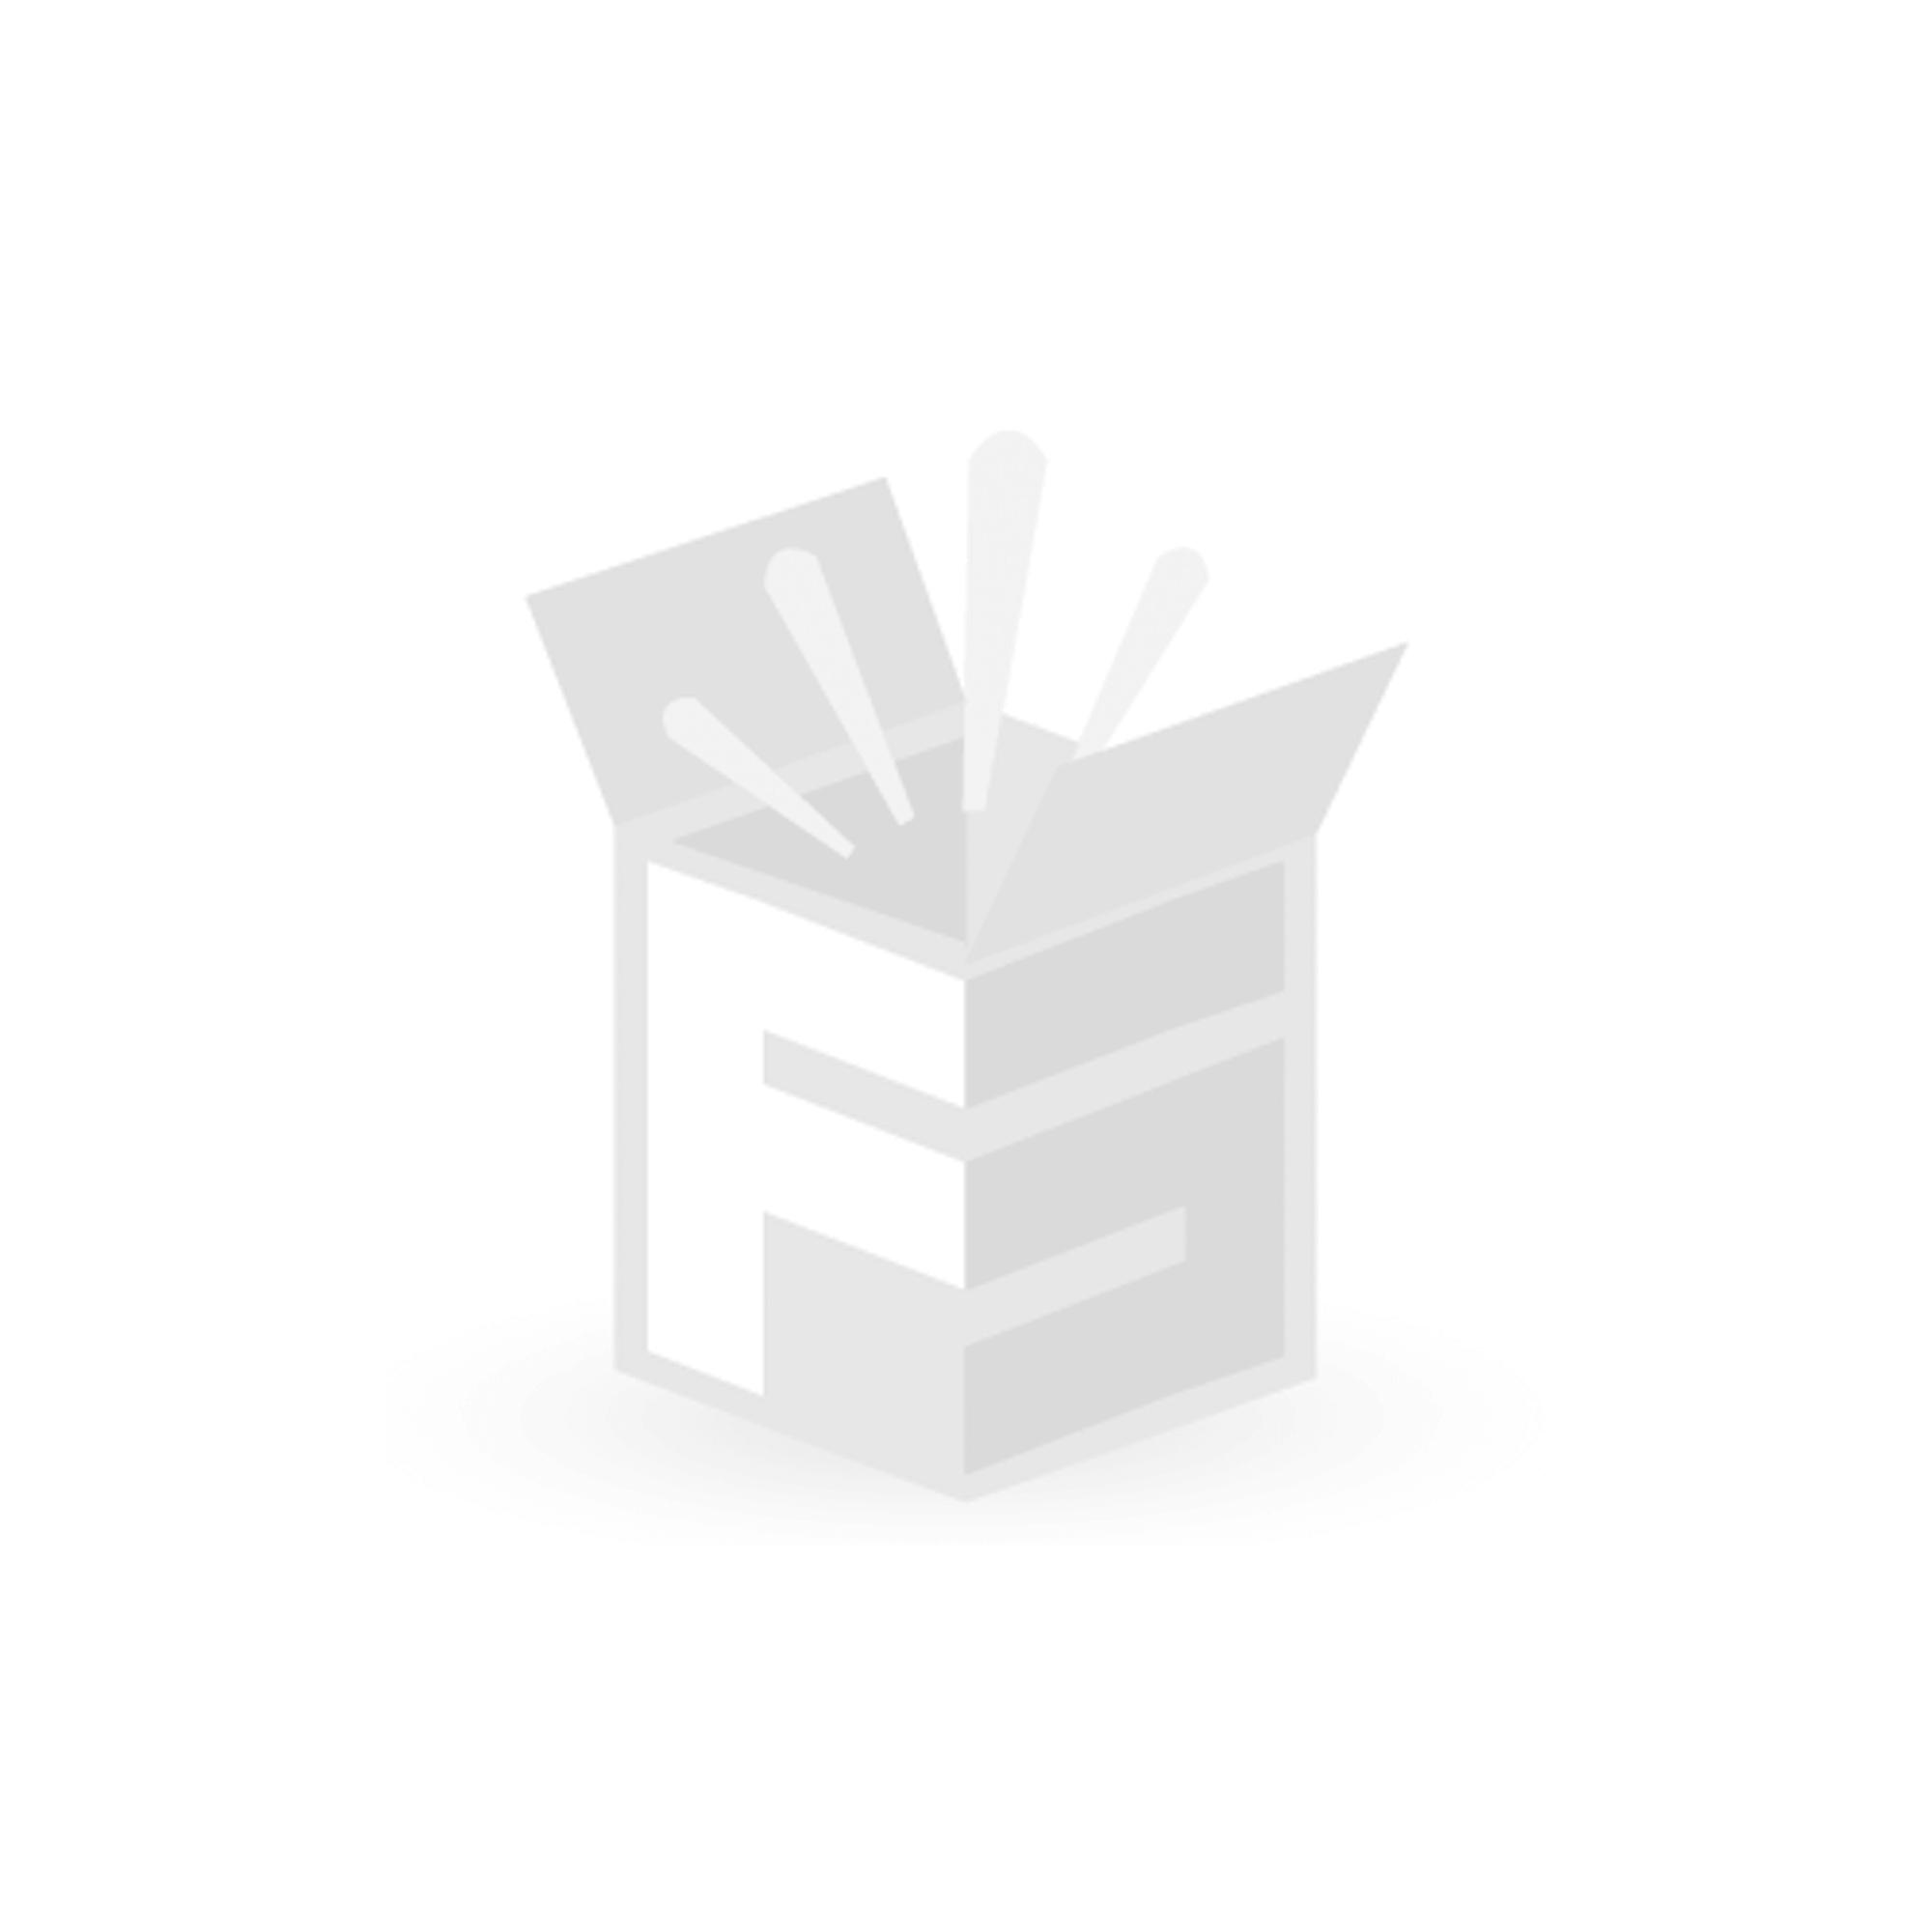 WMF Kochgeschirr-Set Diadem Plus, 4-teilig